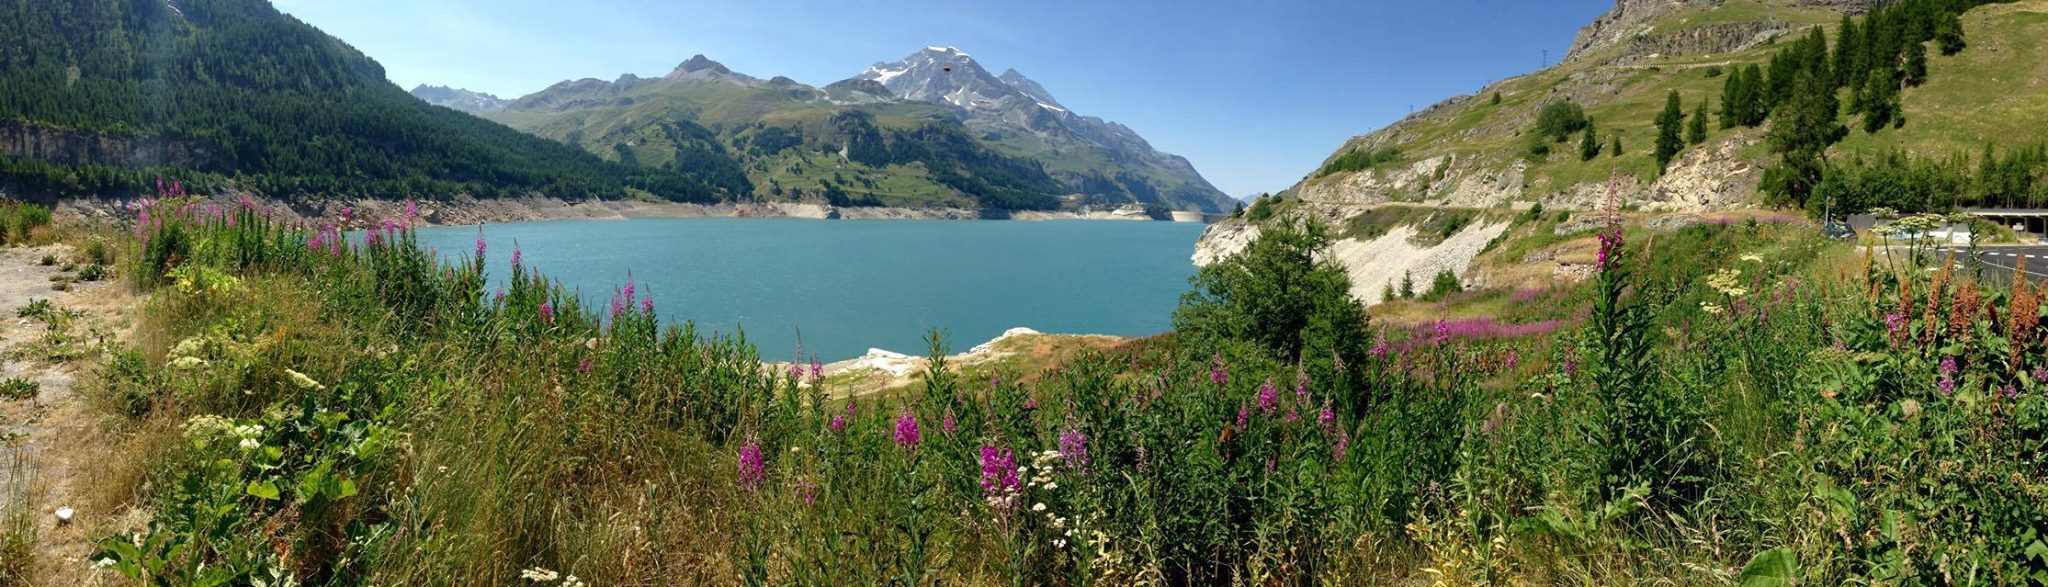 Biking In Tignes Alps